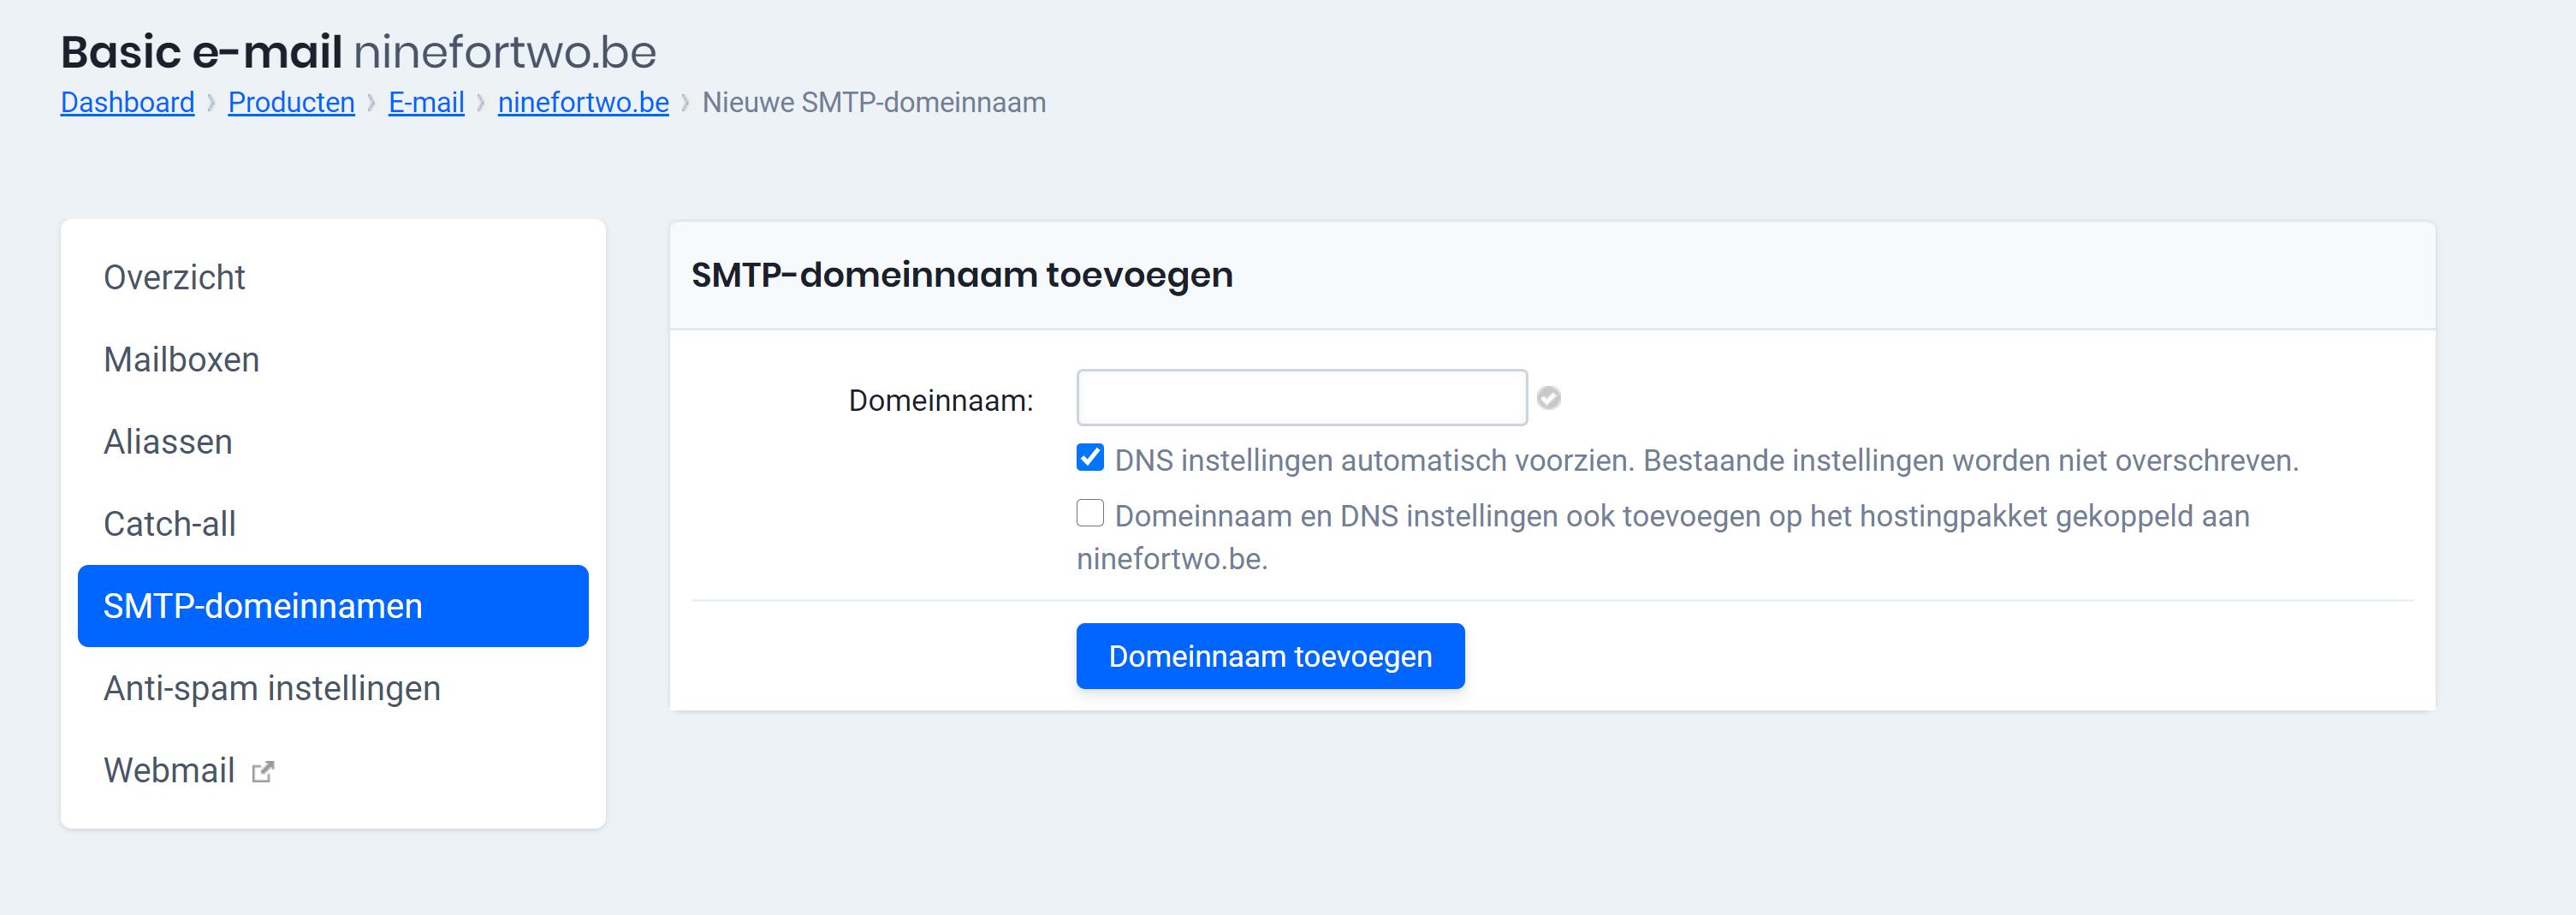 smtp-domeinnaam toevoegen basic NL